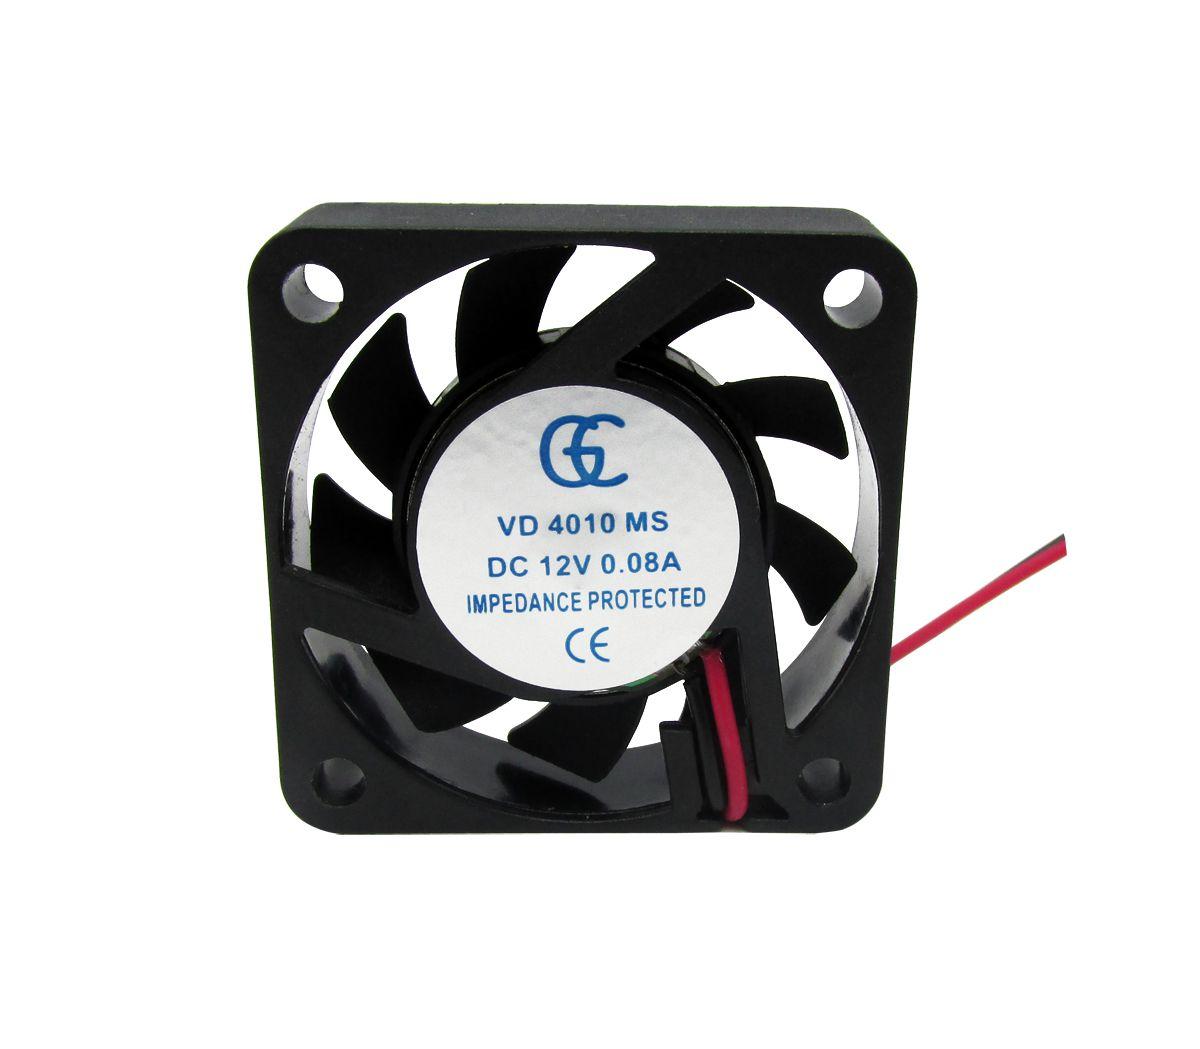 25pcs Ventilador Cooler Ventuinha Gc 40x40x10mm 12v Fan Nova Qualidade Nota Fiscal